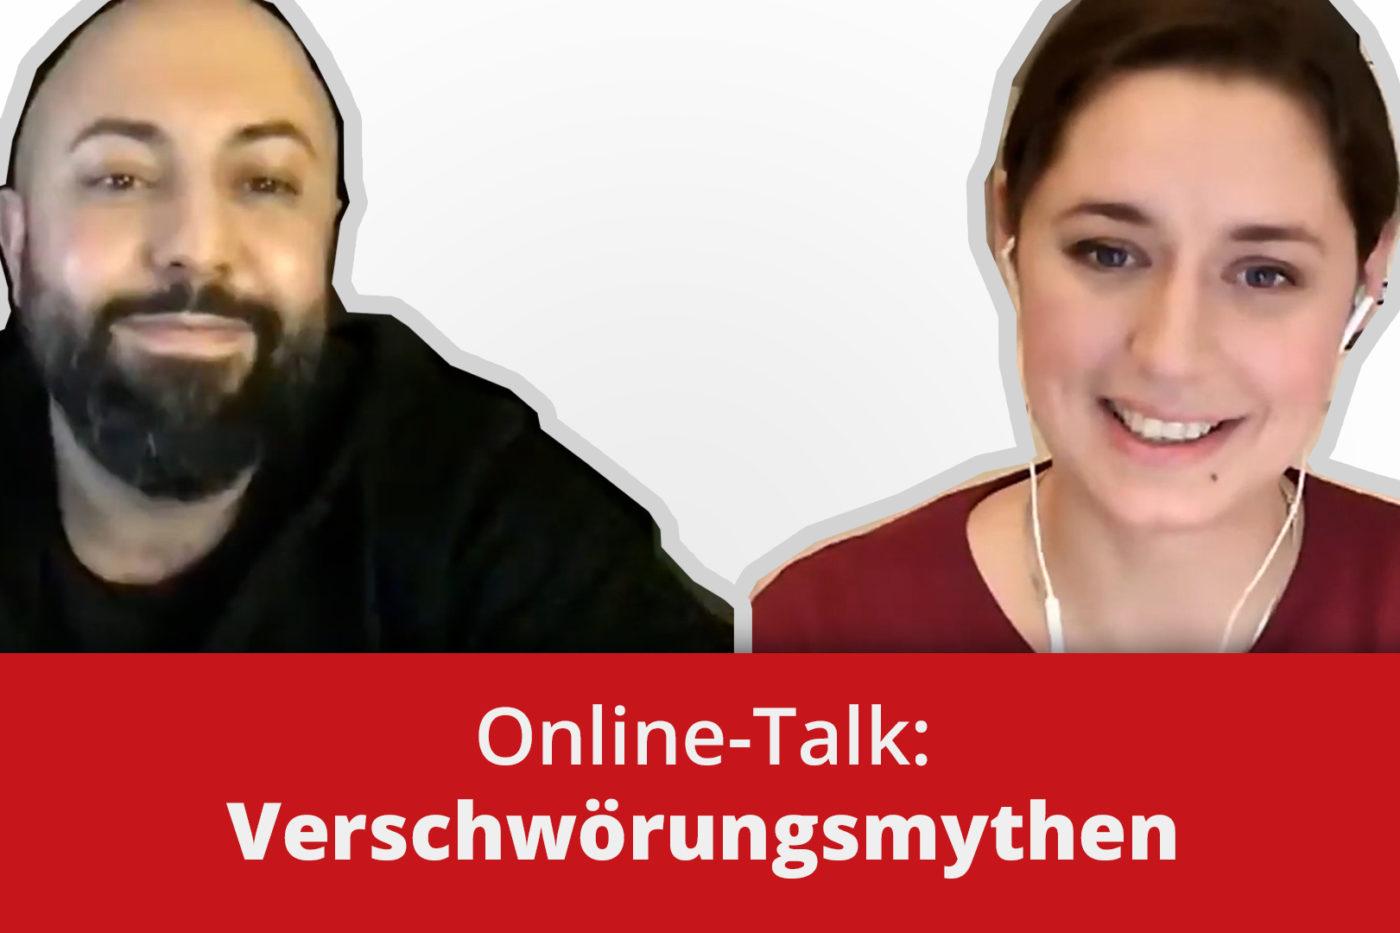 Online-Talk: Verschwörungsmythen